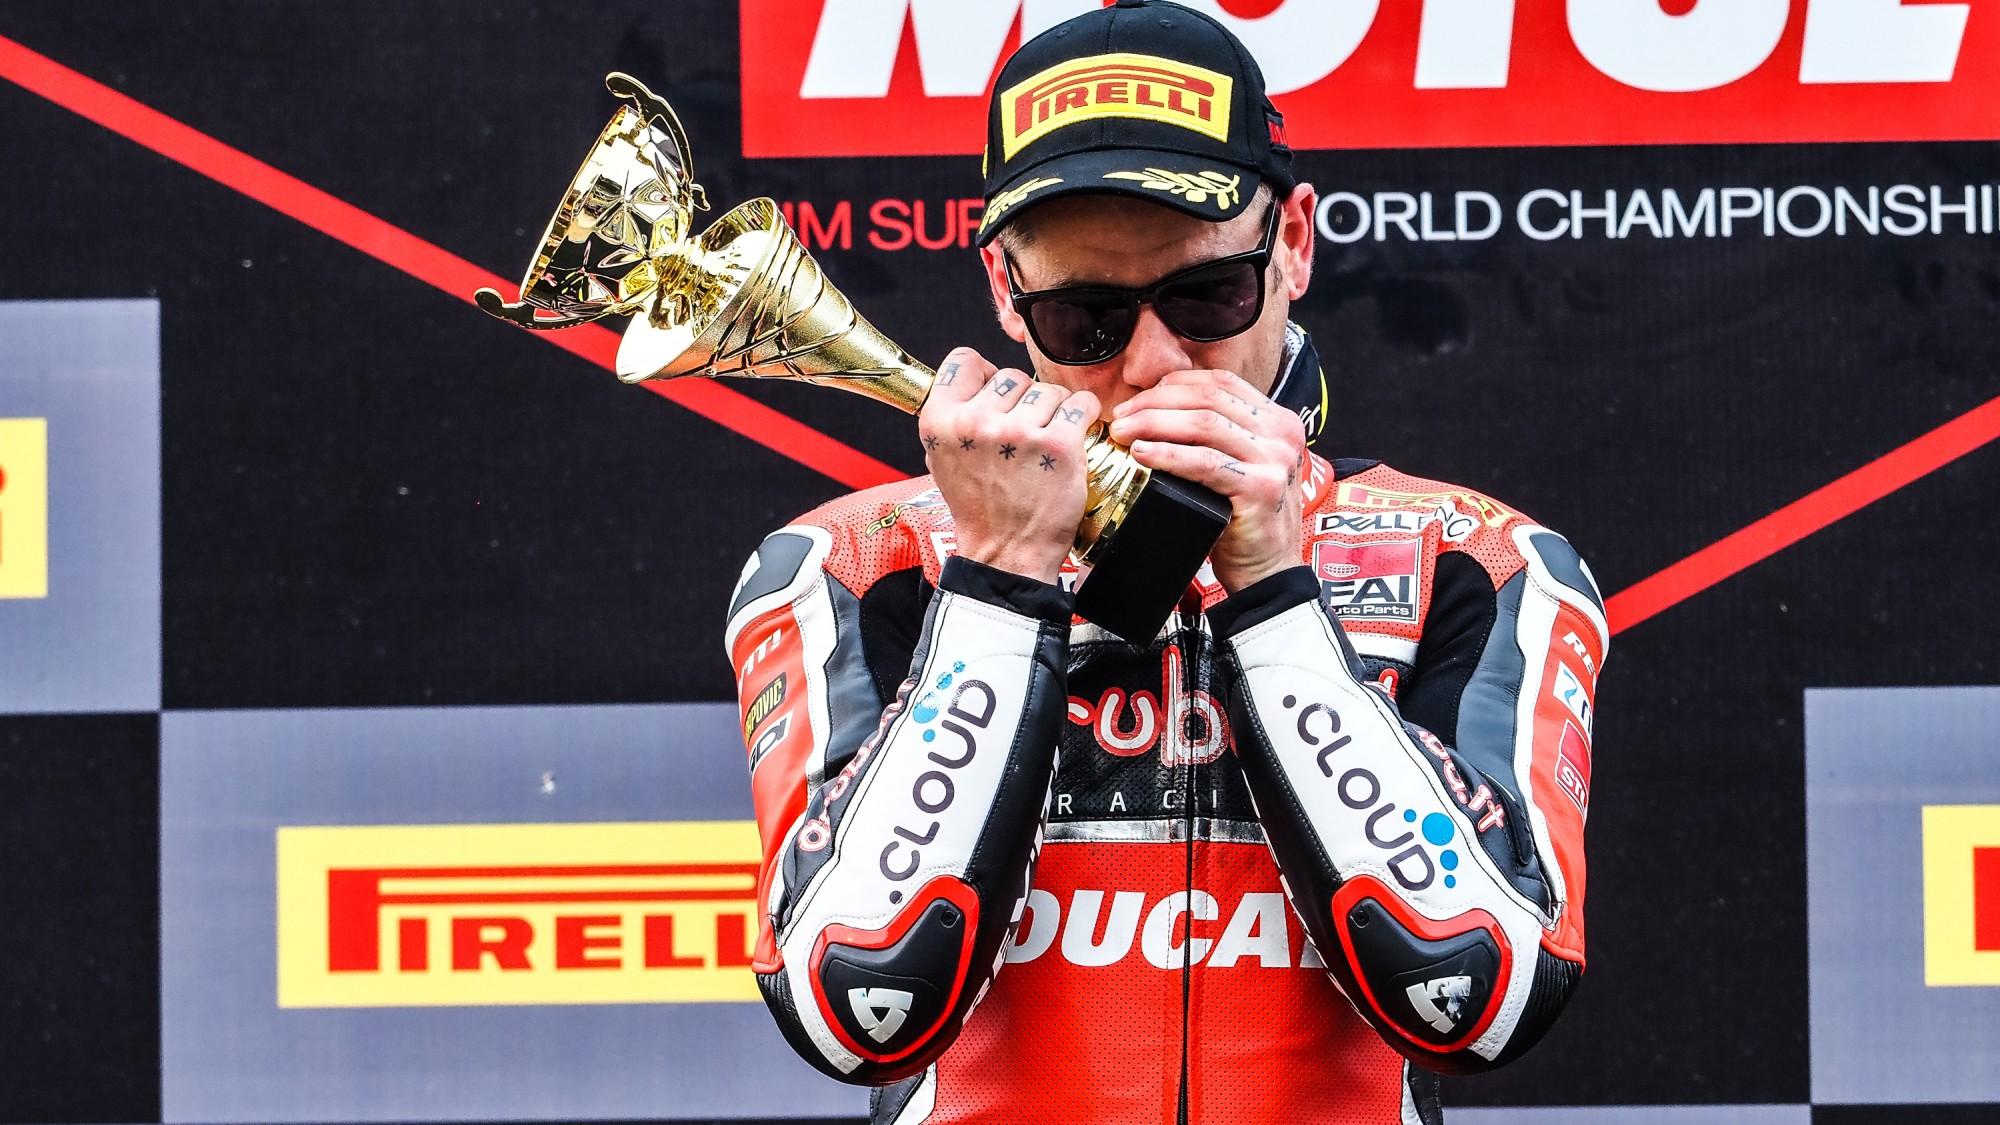 WSBK 2019: Ducati Bautista